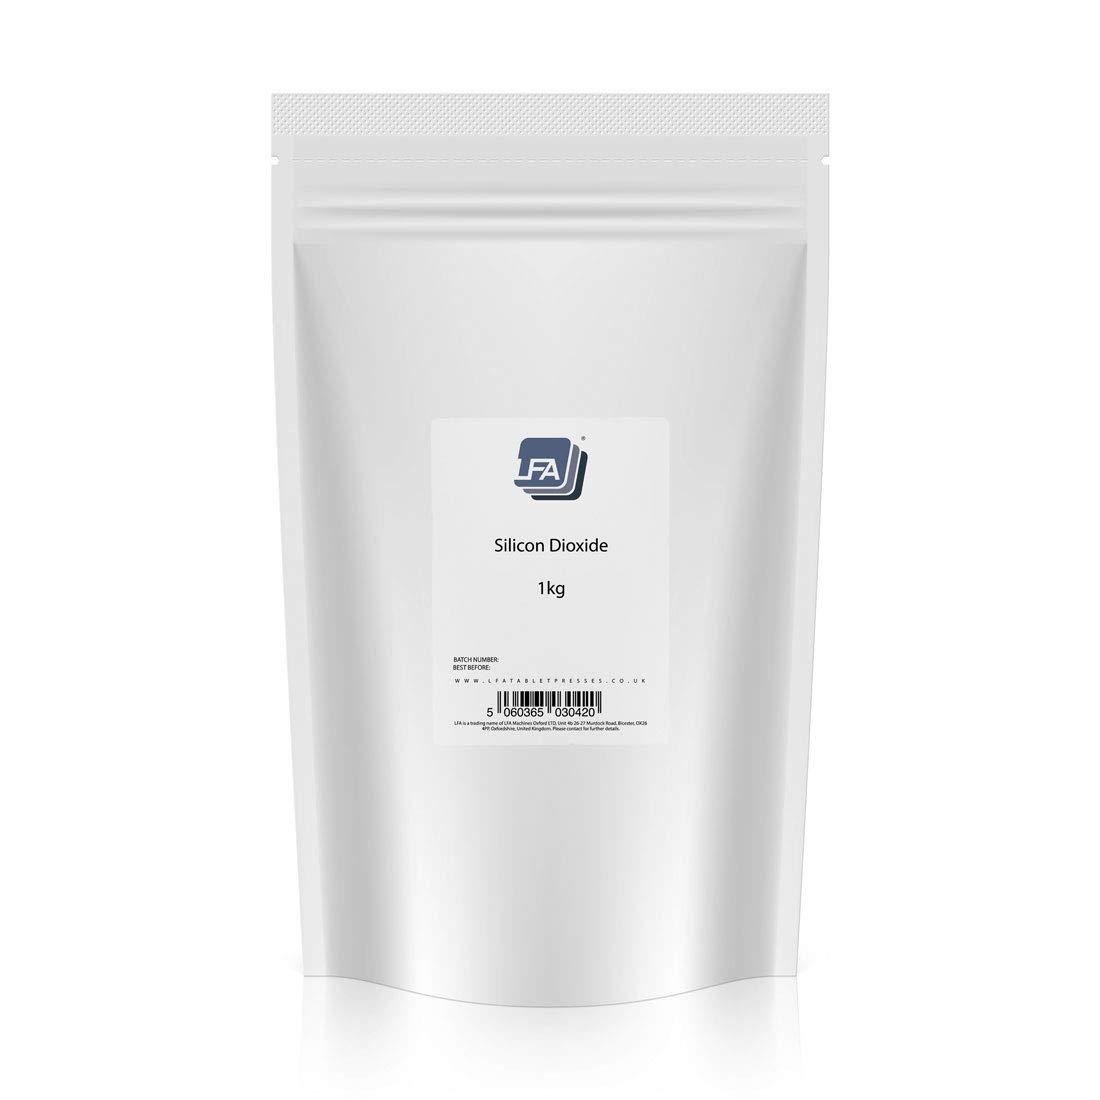 LFA Silicon Dioxide (Silica) Powder - Tablet Flowing & Anti-Caking Agent - 1kg (2.2 lbs)